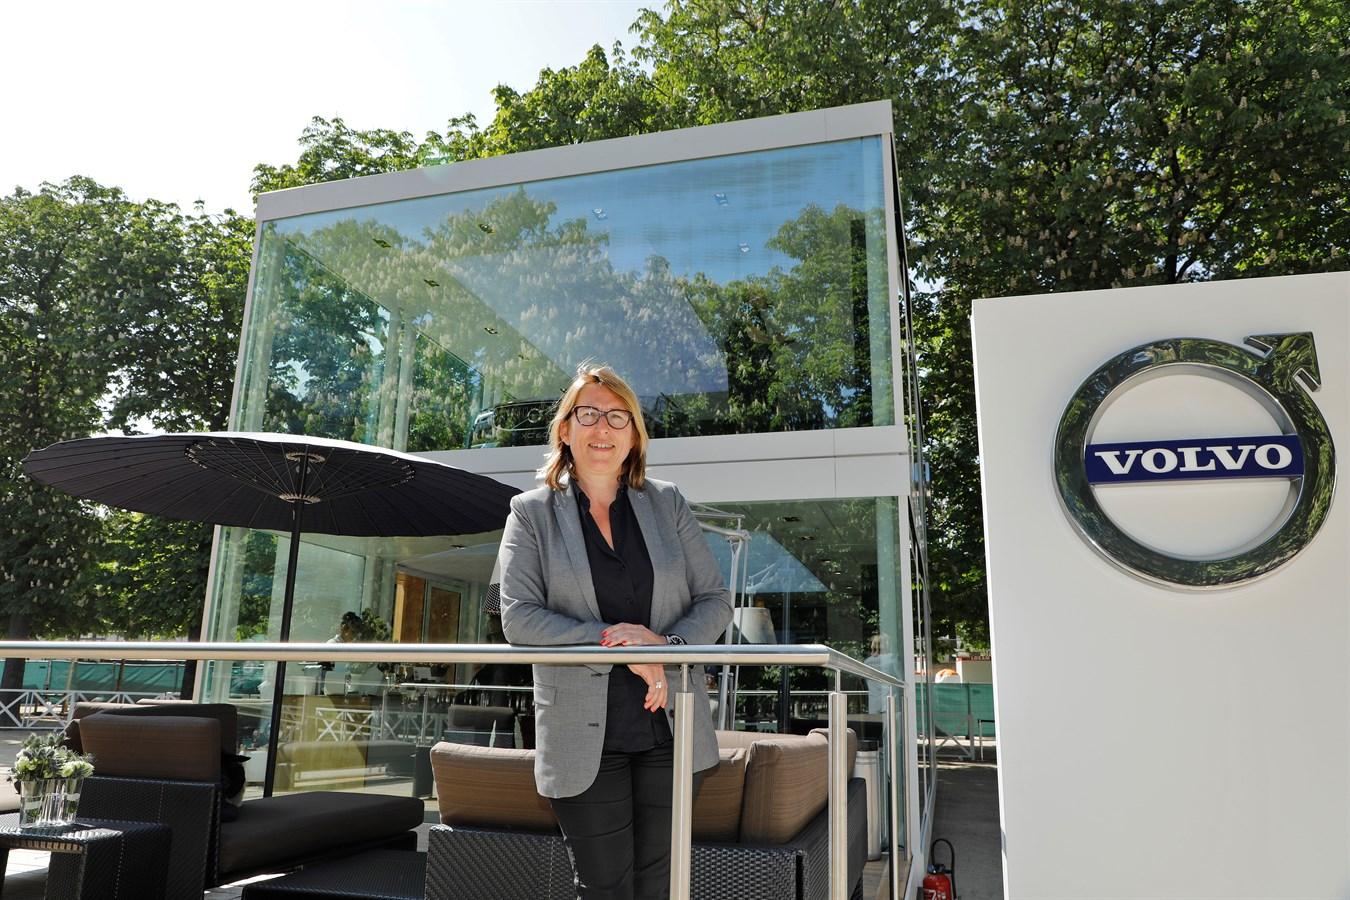 Nathalie Duneau, Directeur Marketing, Volvo Car France